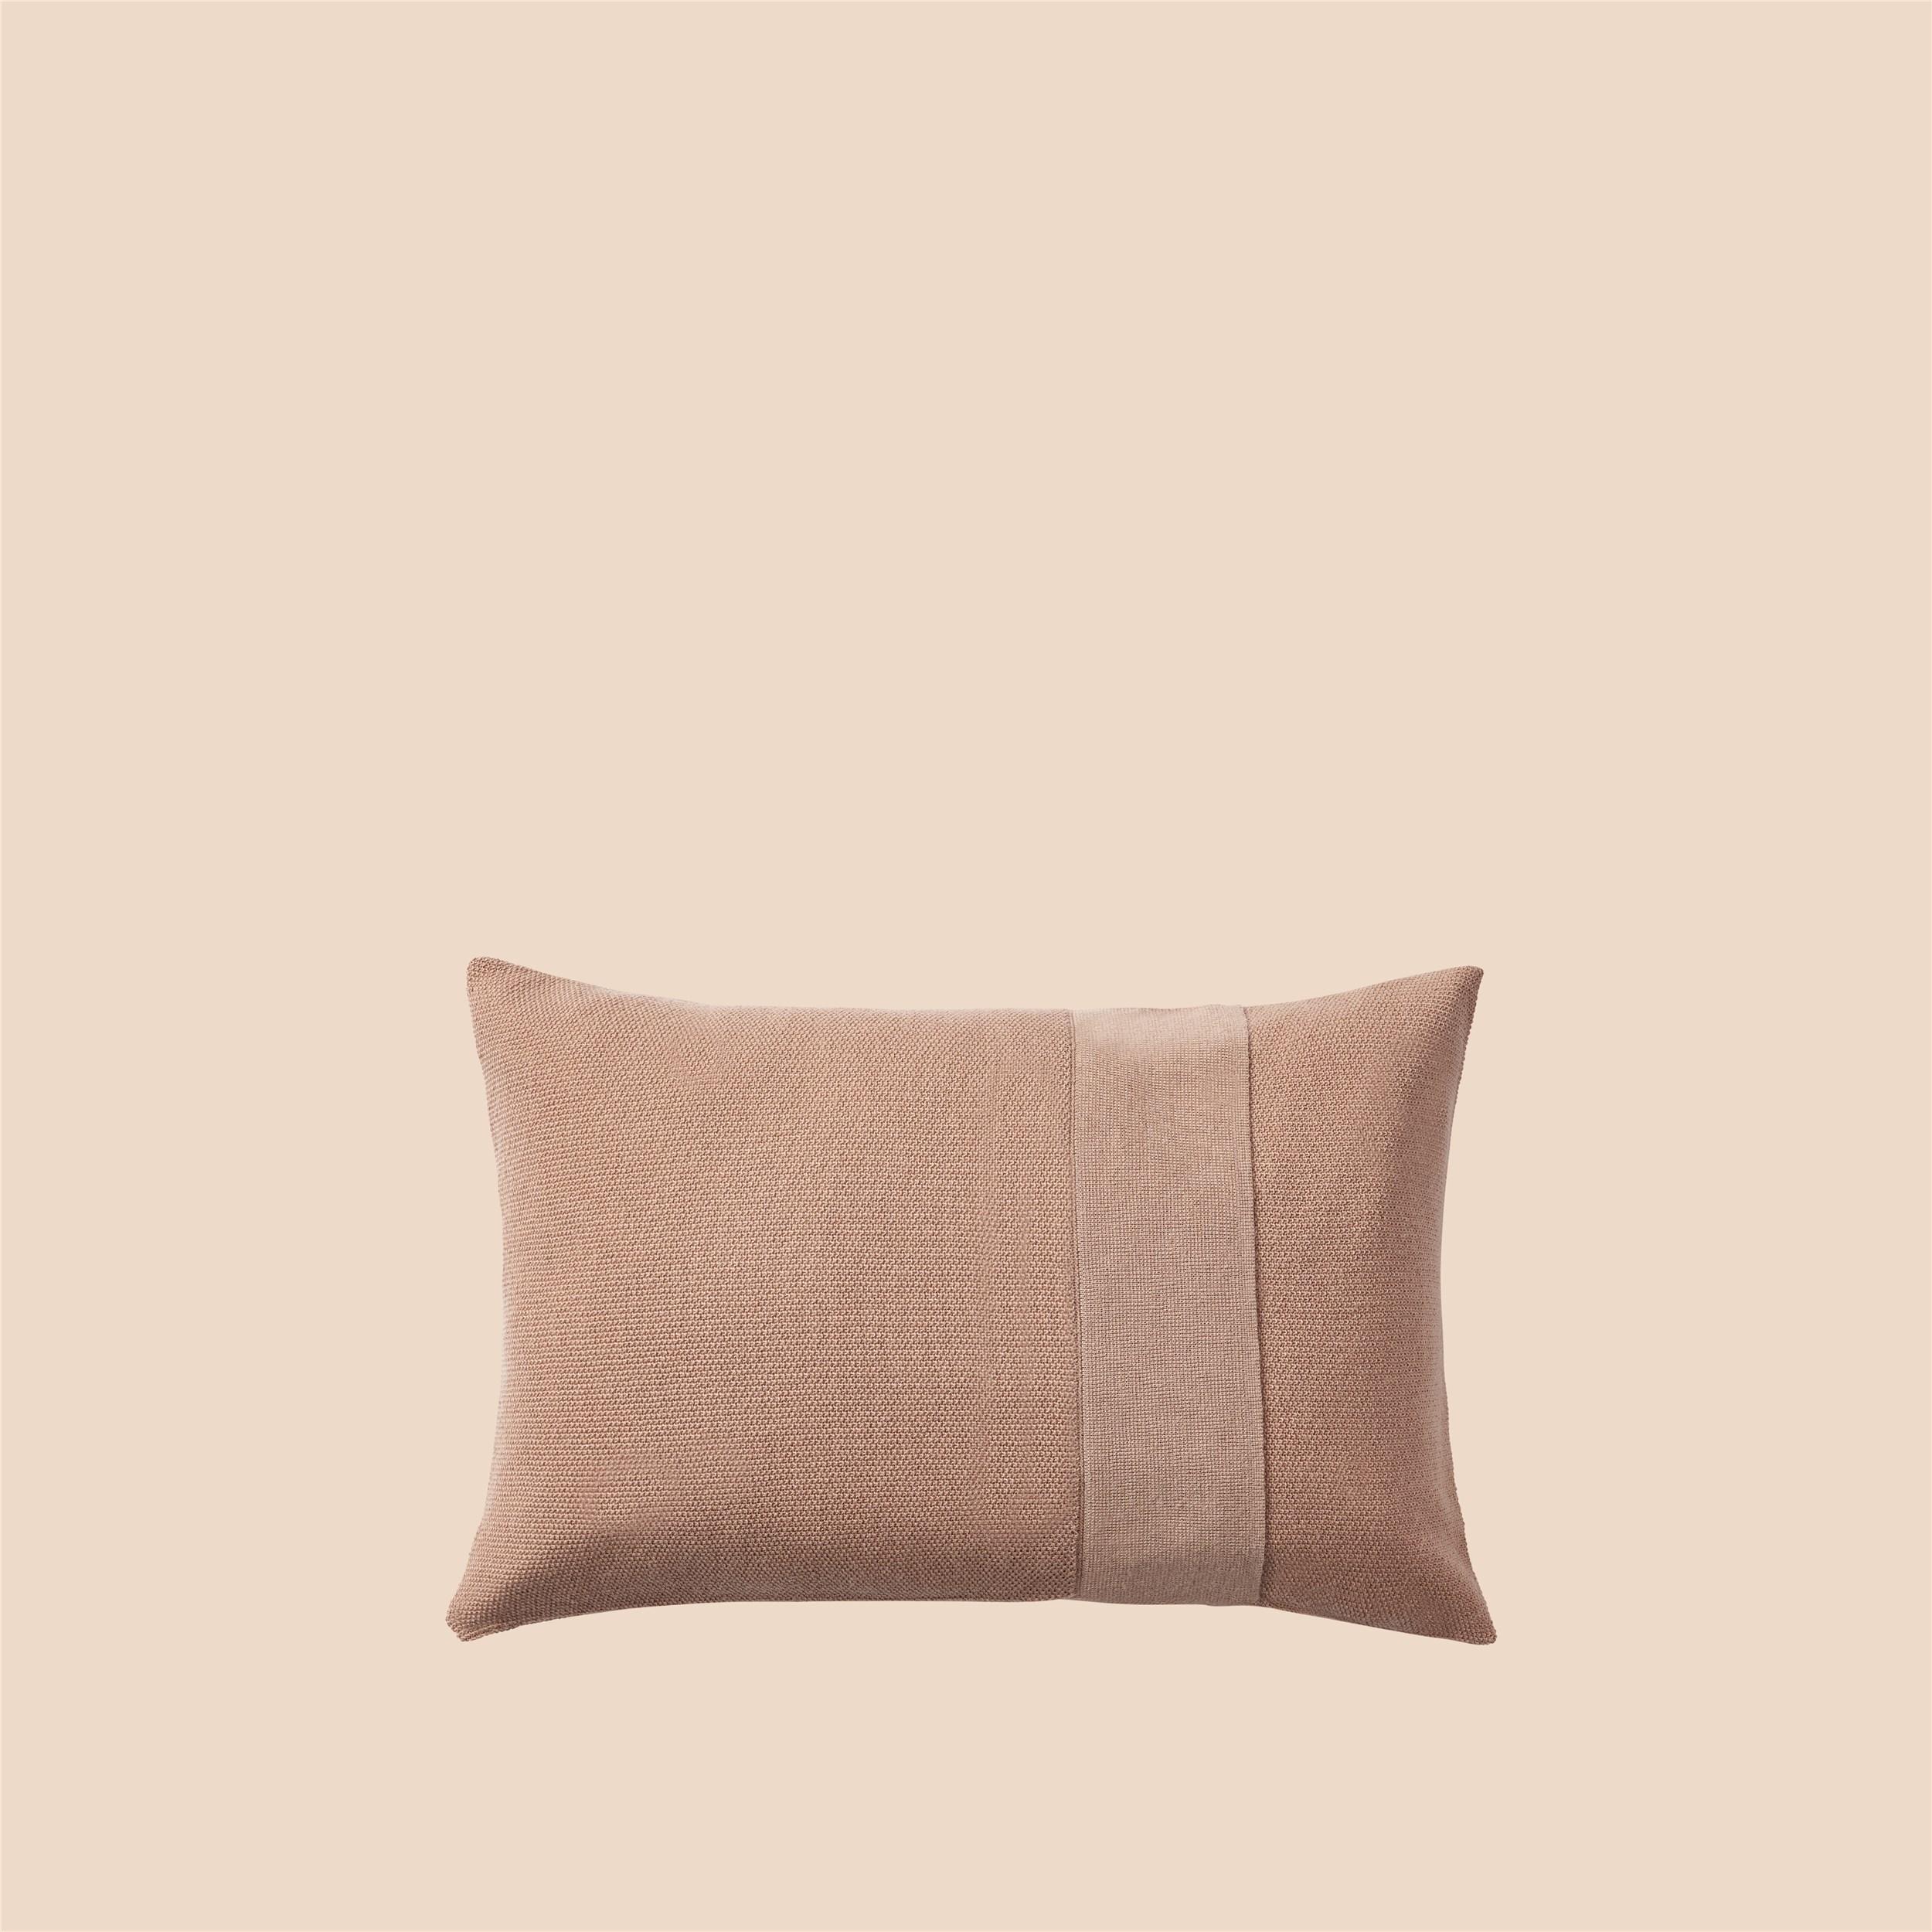 Layer Cushion 40x60 dusty rose